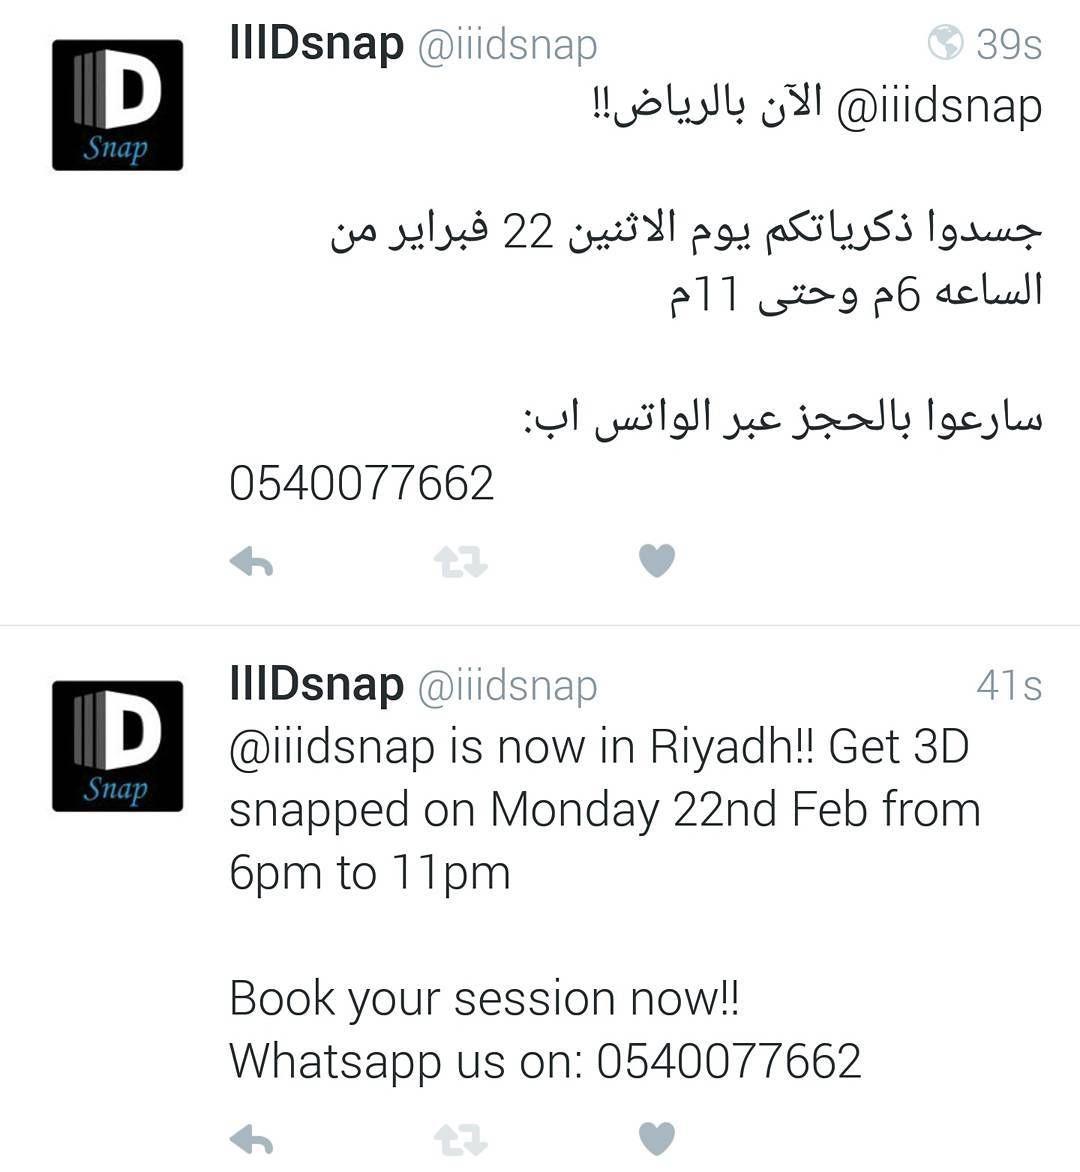 Iiid Snap On Instagram الآن بـ الرياض سارعوا بحجز جلسة التصوير ثلاثي الأبعاد Now In Riyadh Book Your 3d Session Now Instagram Posts Instagram Books